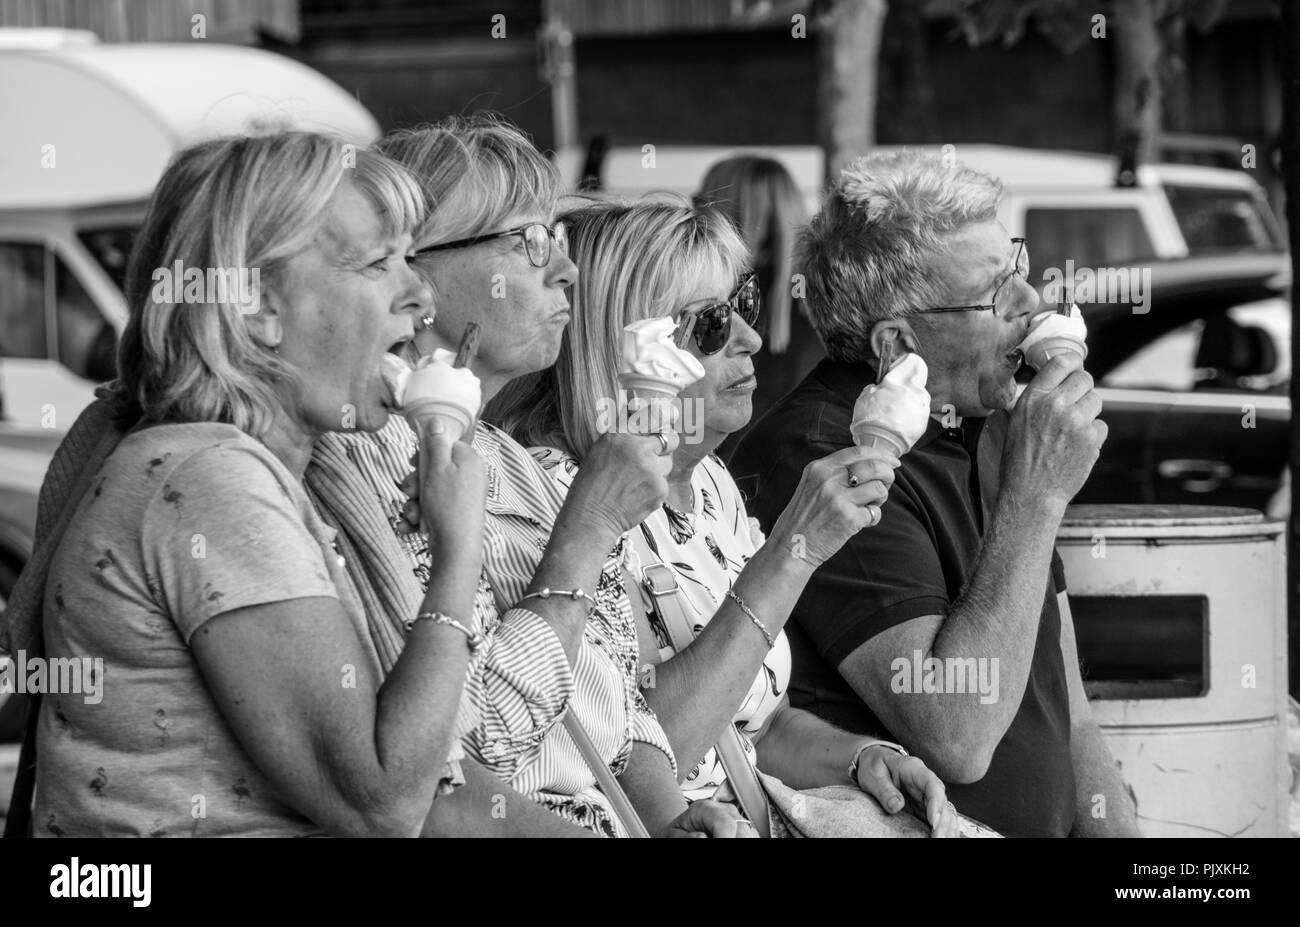 Middle aged couples eating ice creams, England, UK - Stock Image